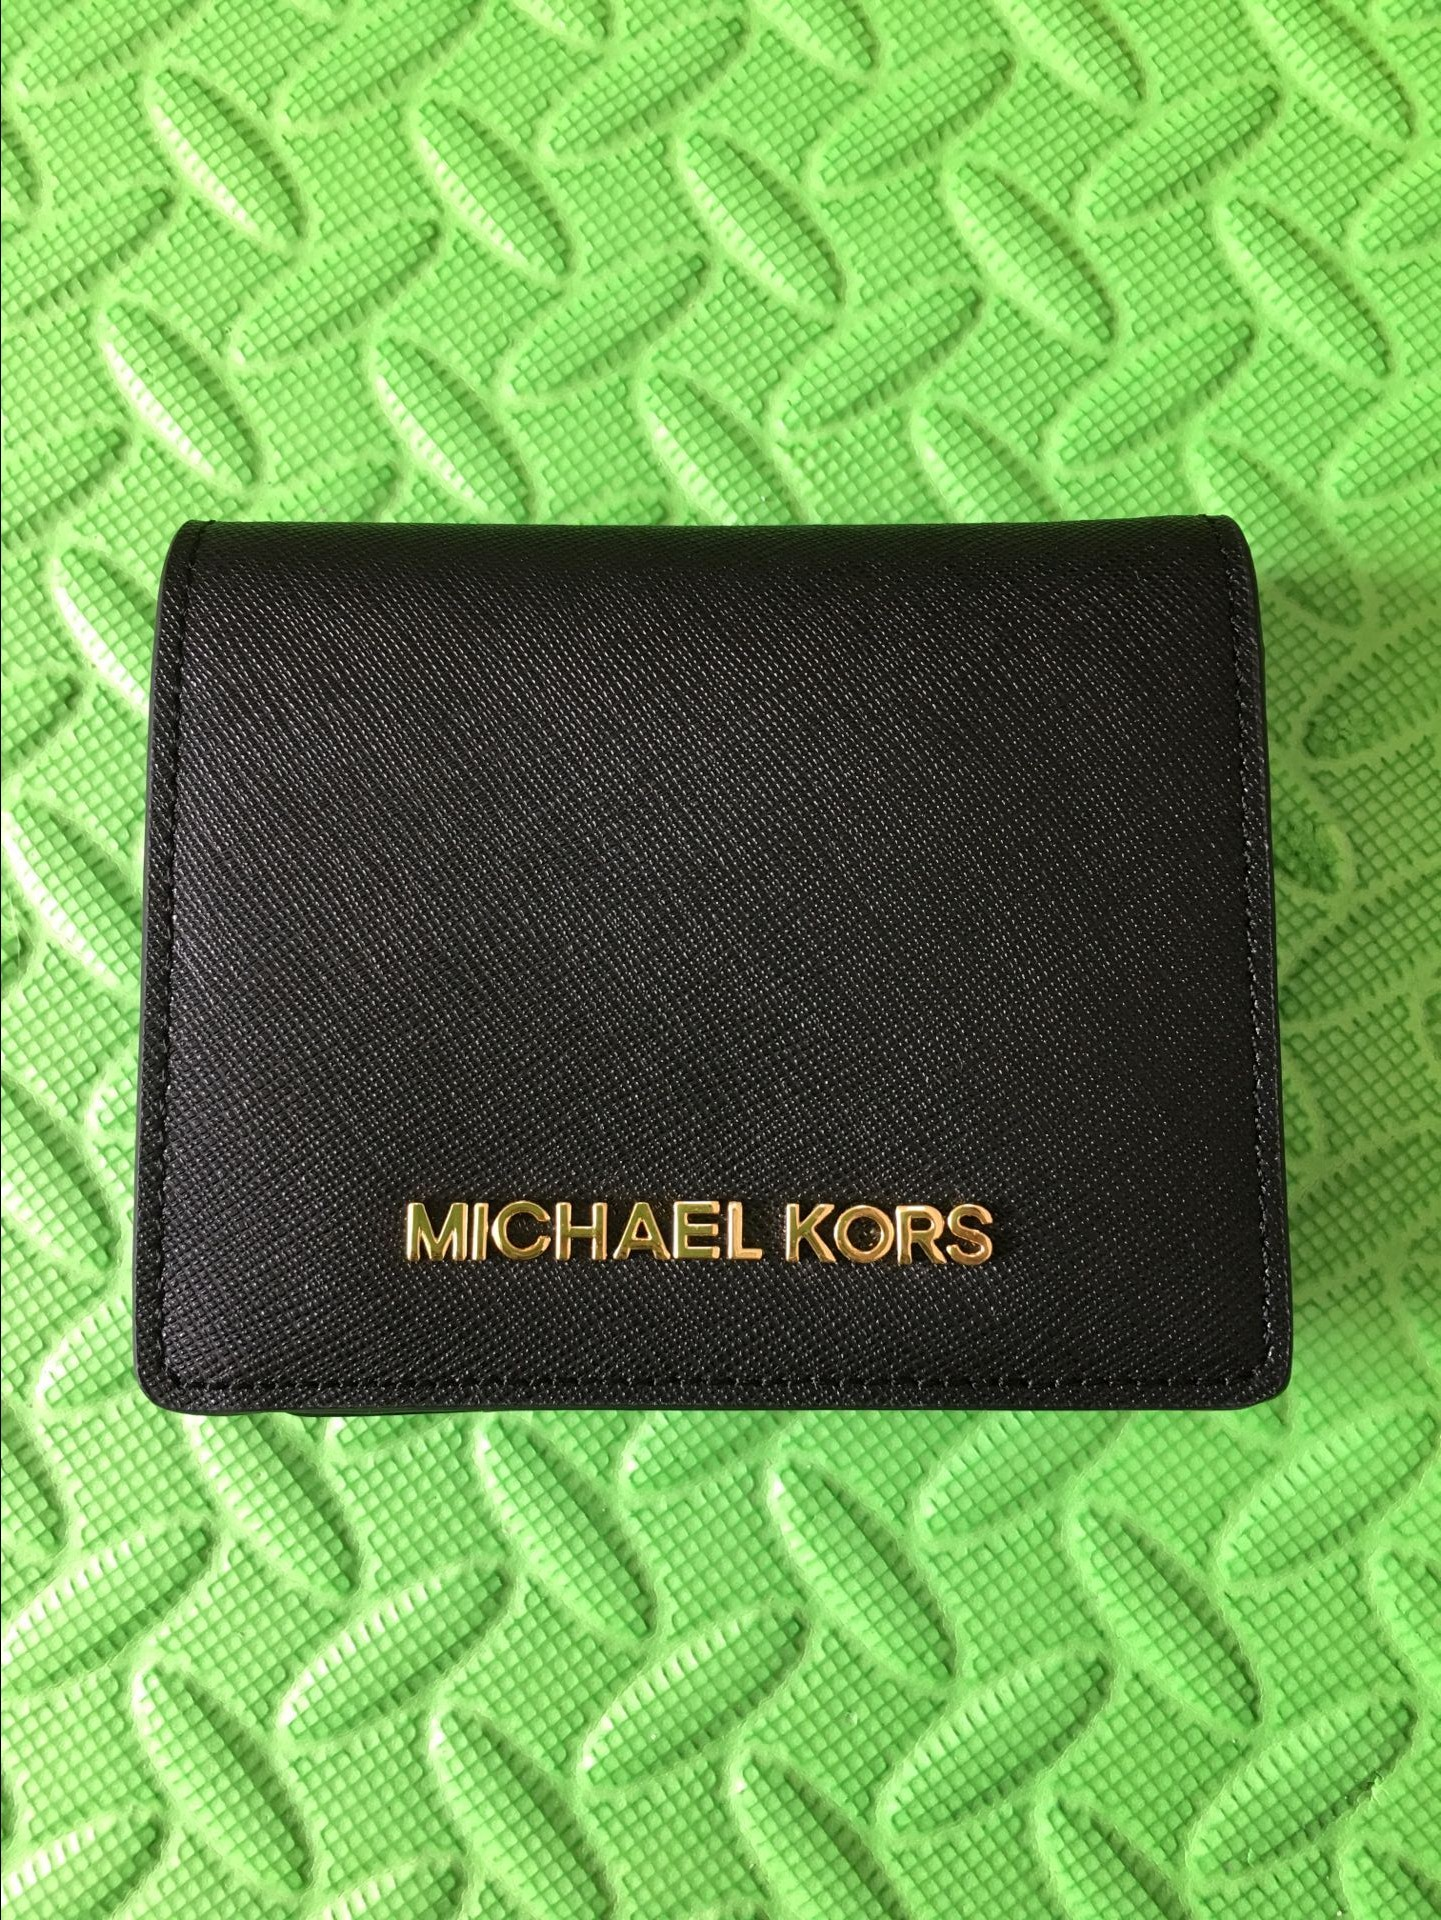 afec40b735be Michael Kors Jet Set Travel Flap Card Holder Wallet Black Authentic ...